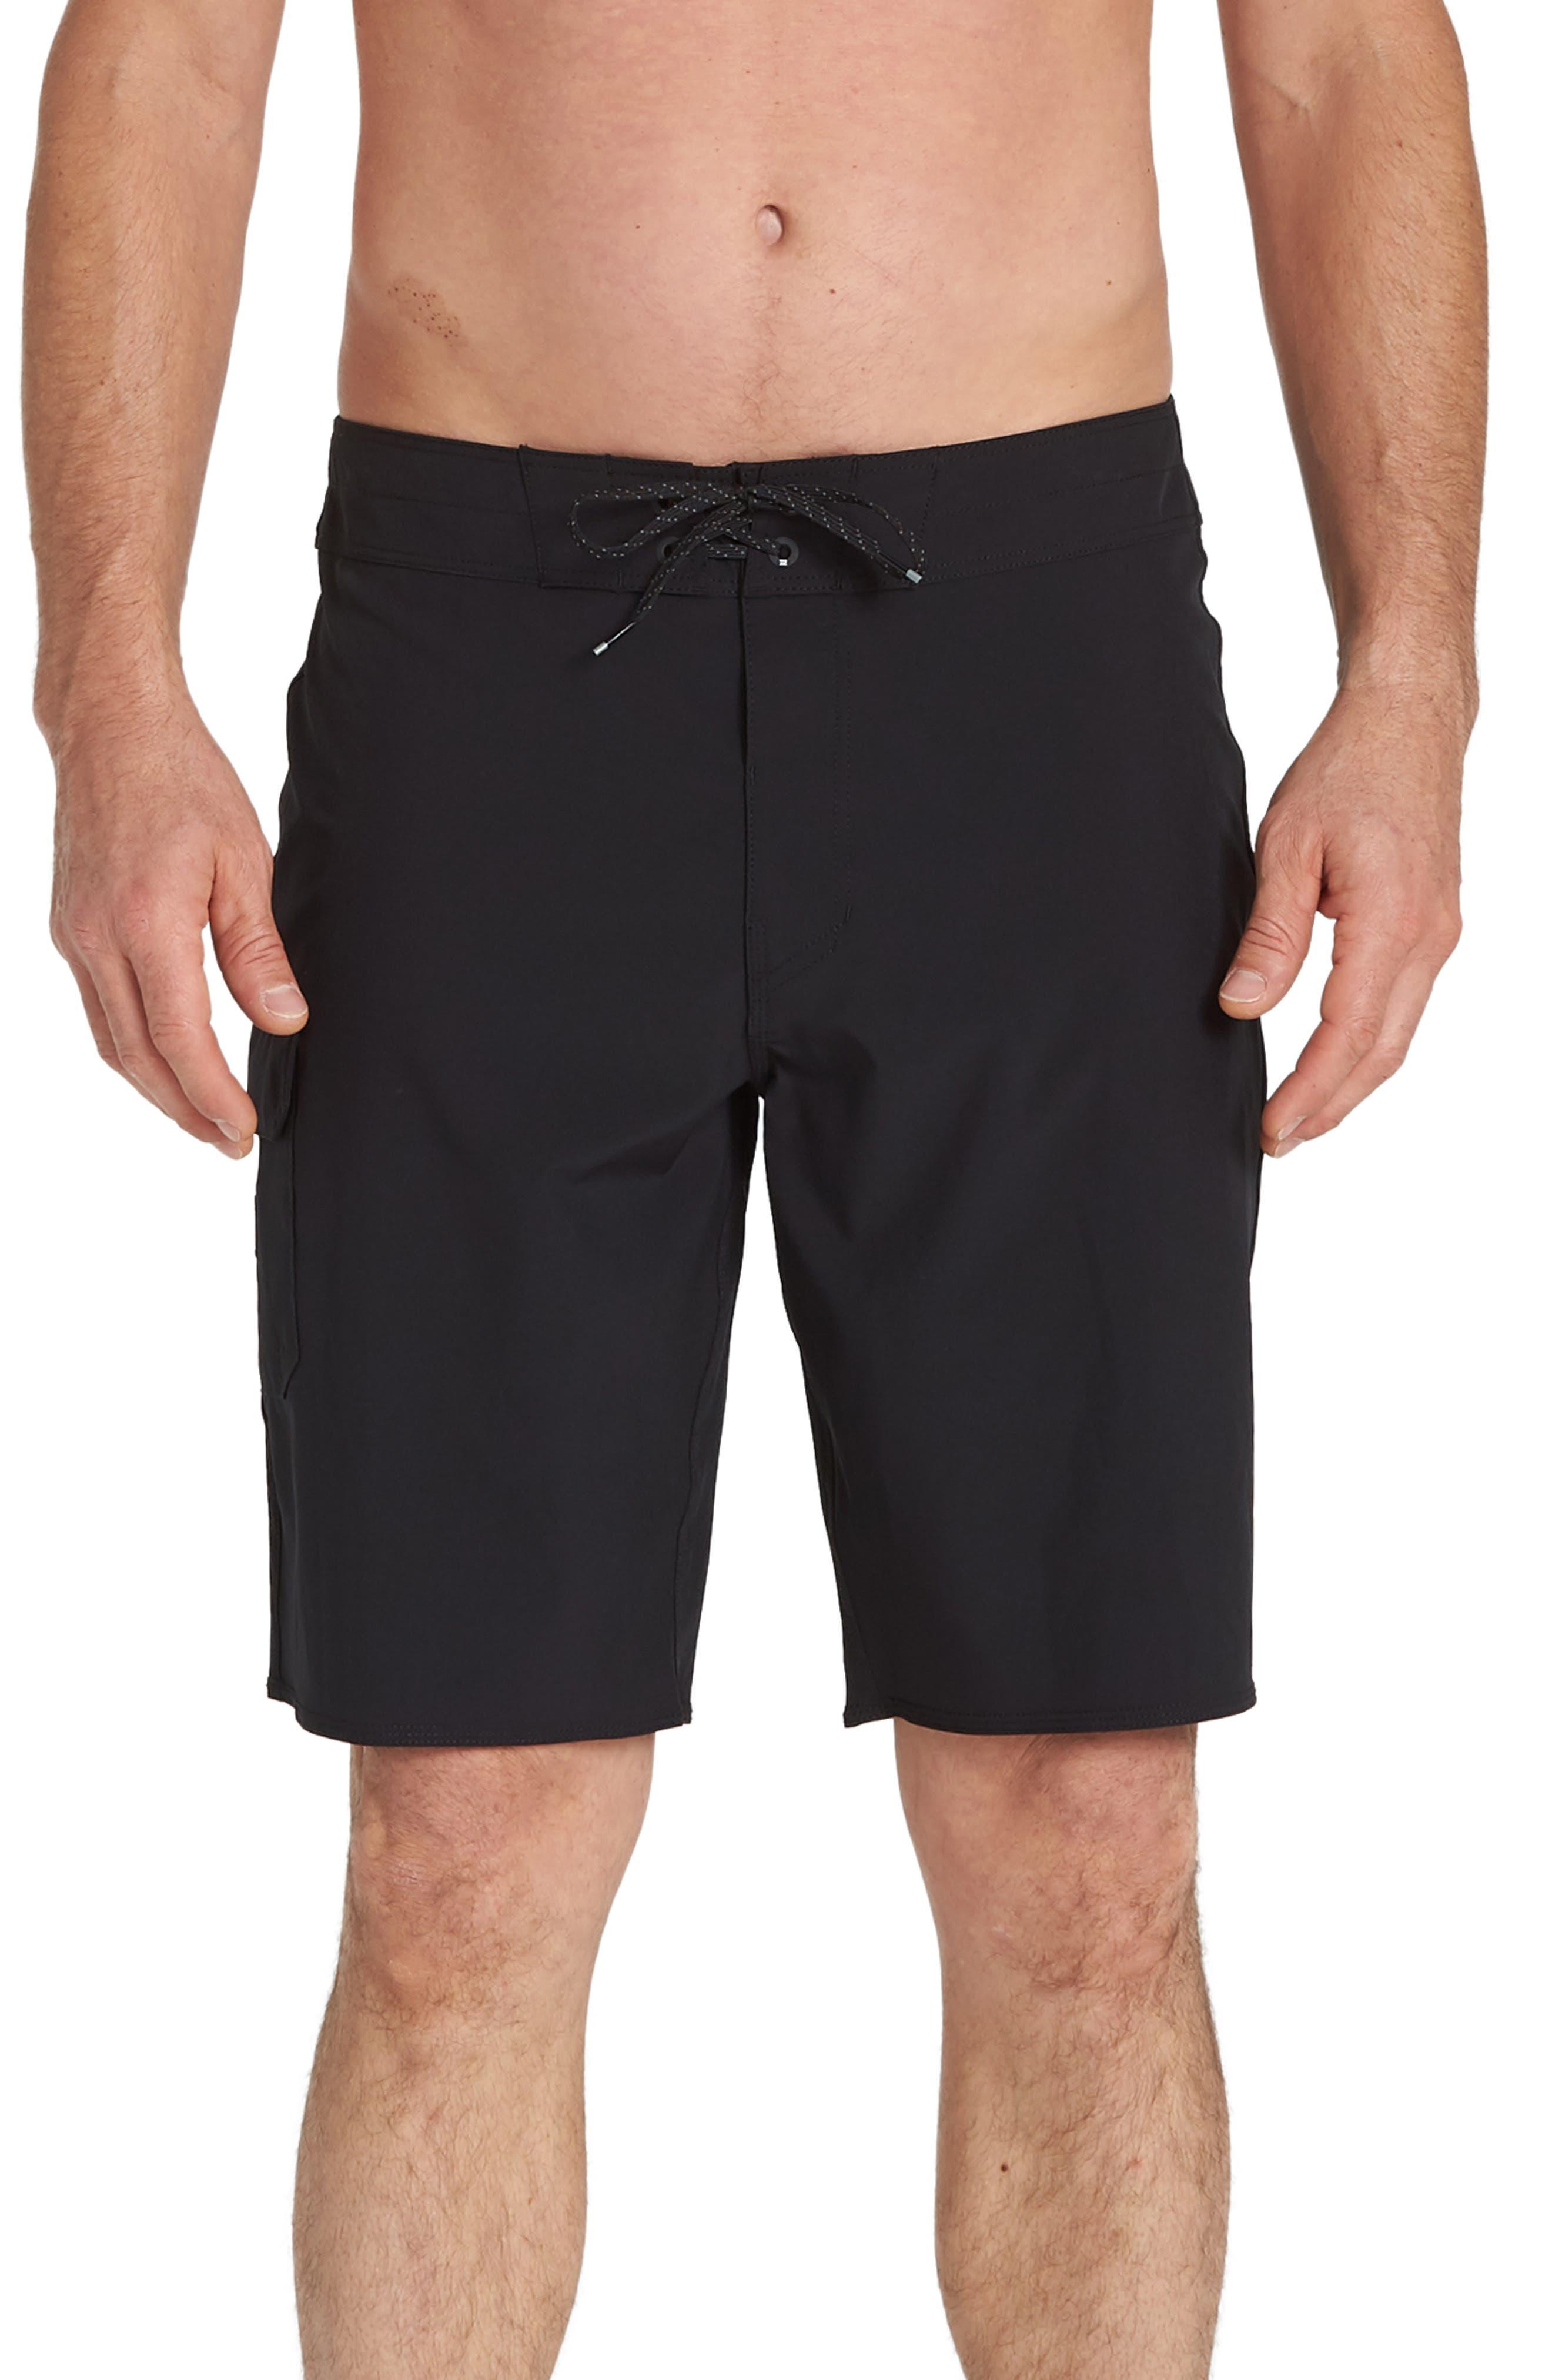 Billabong All Day Pro Board Shorts, Black